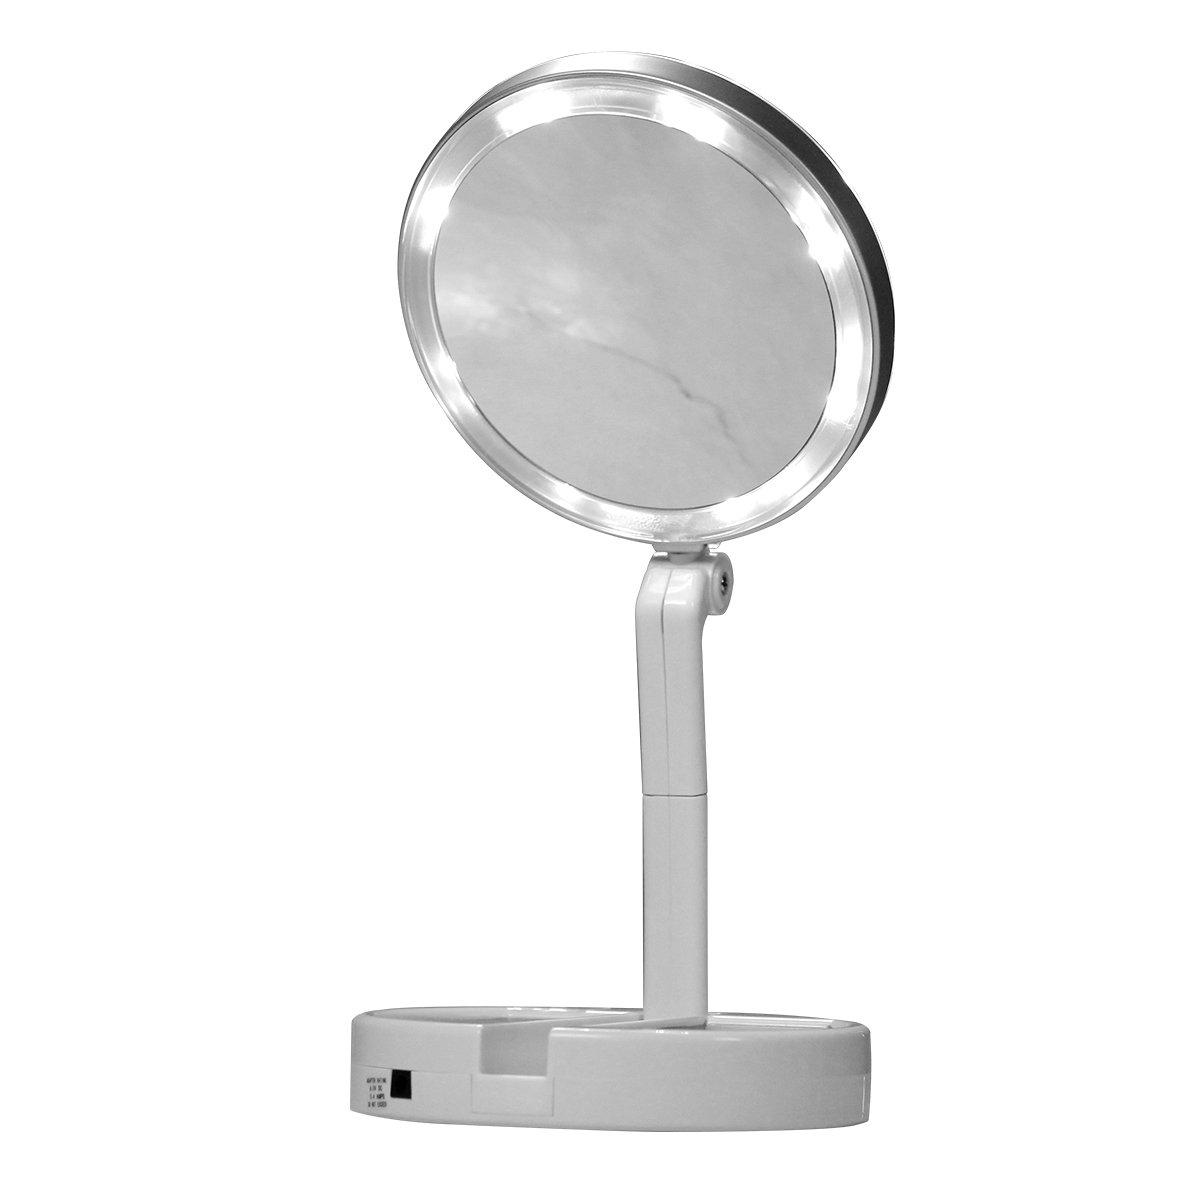 JML Flawless Folding Mirror - The take-anywhere LED magnifying mirror f0qff50100000001